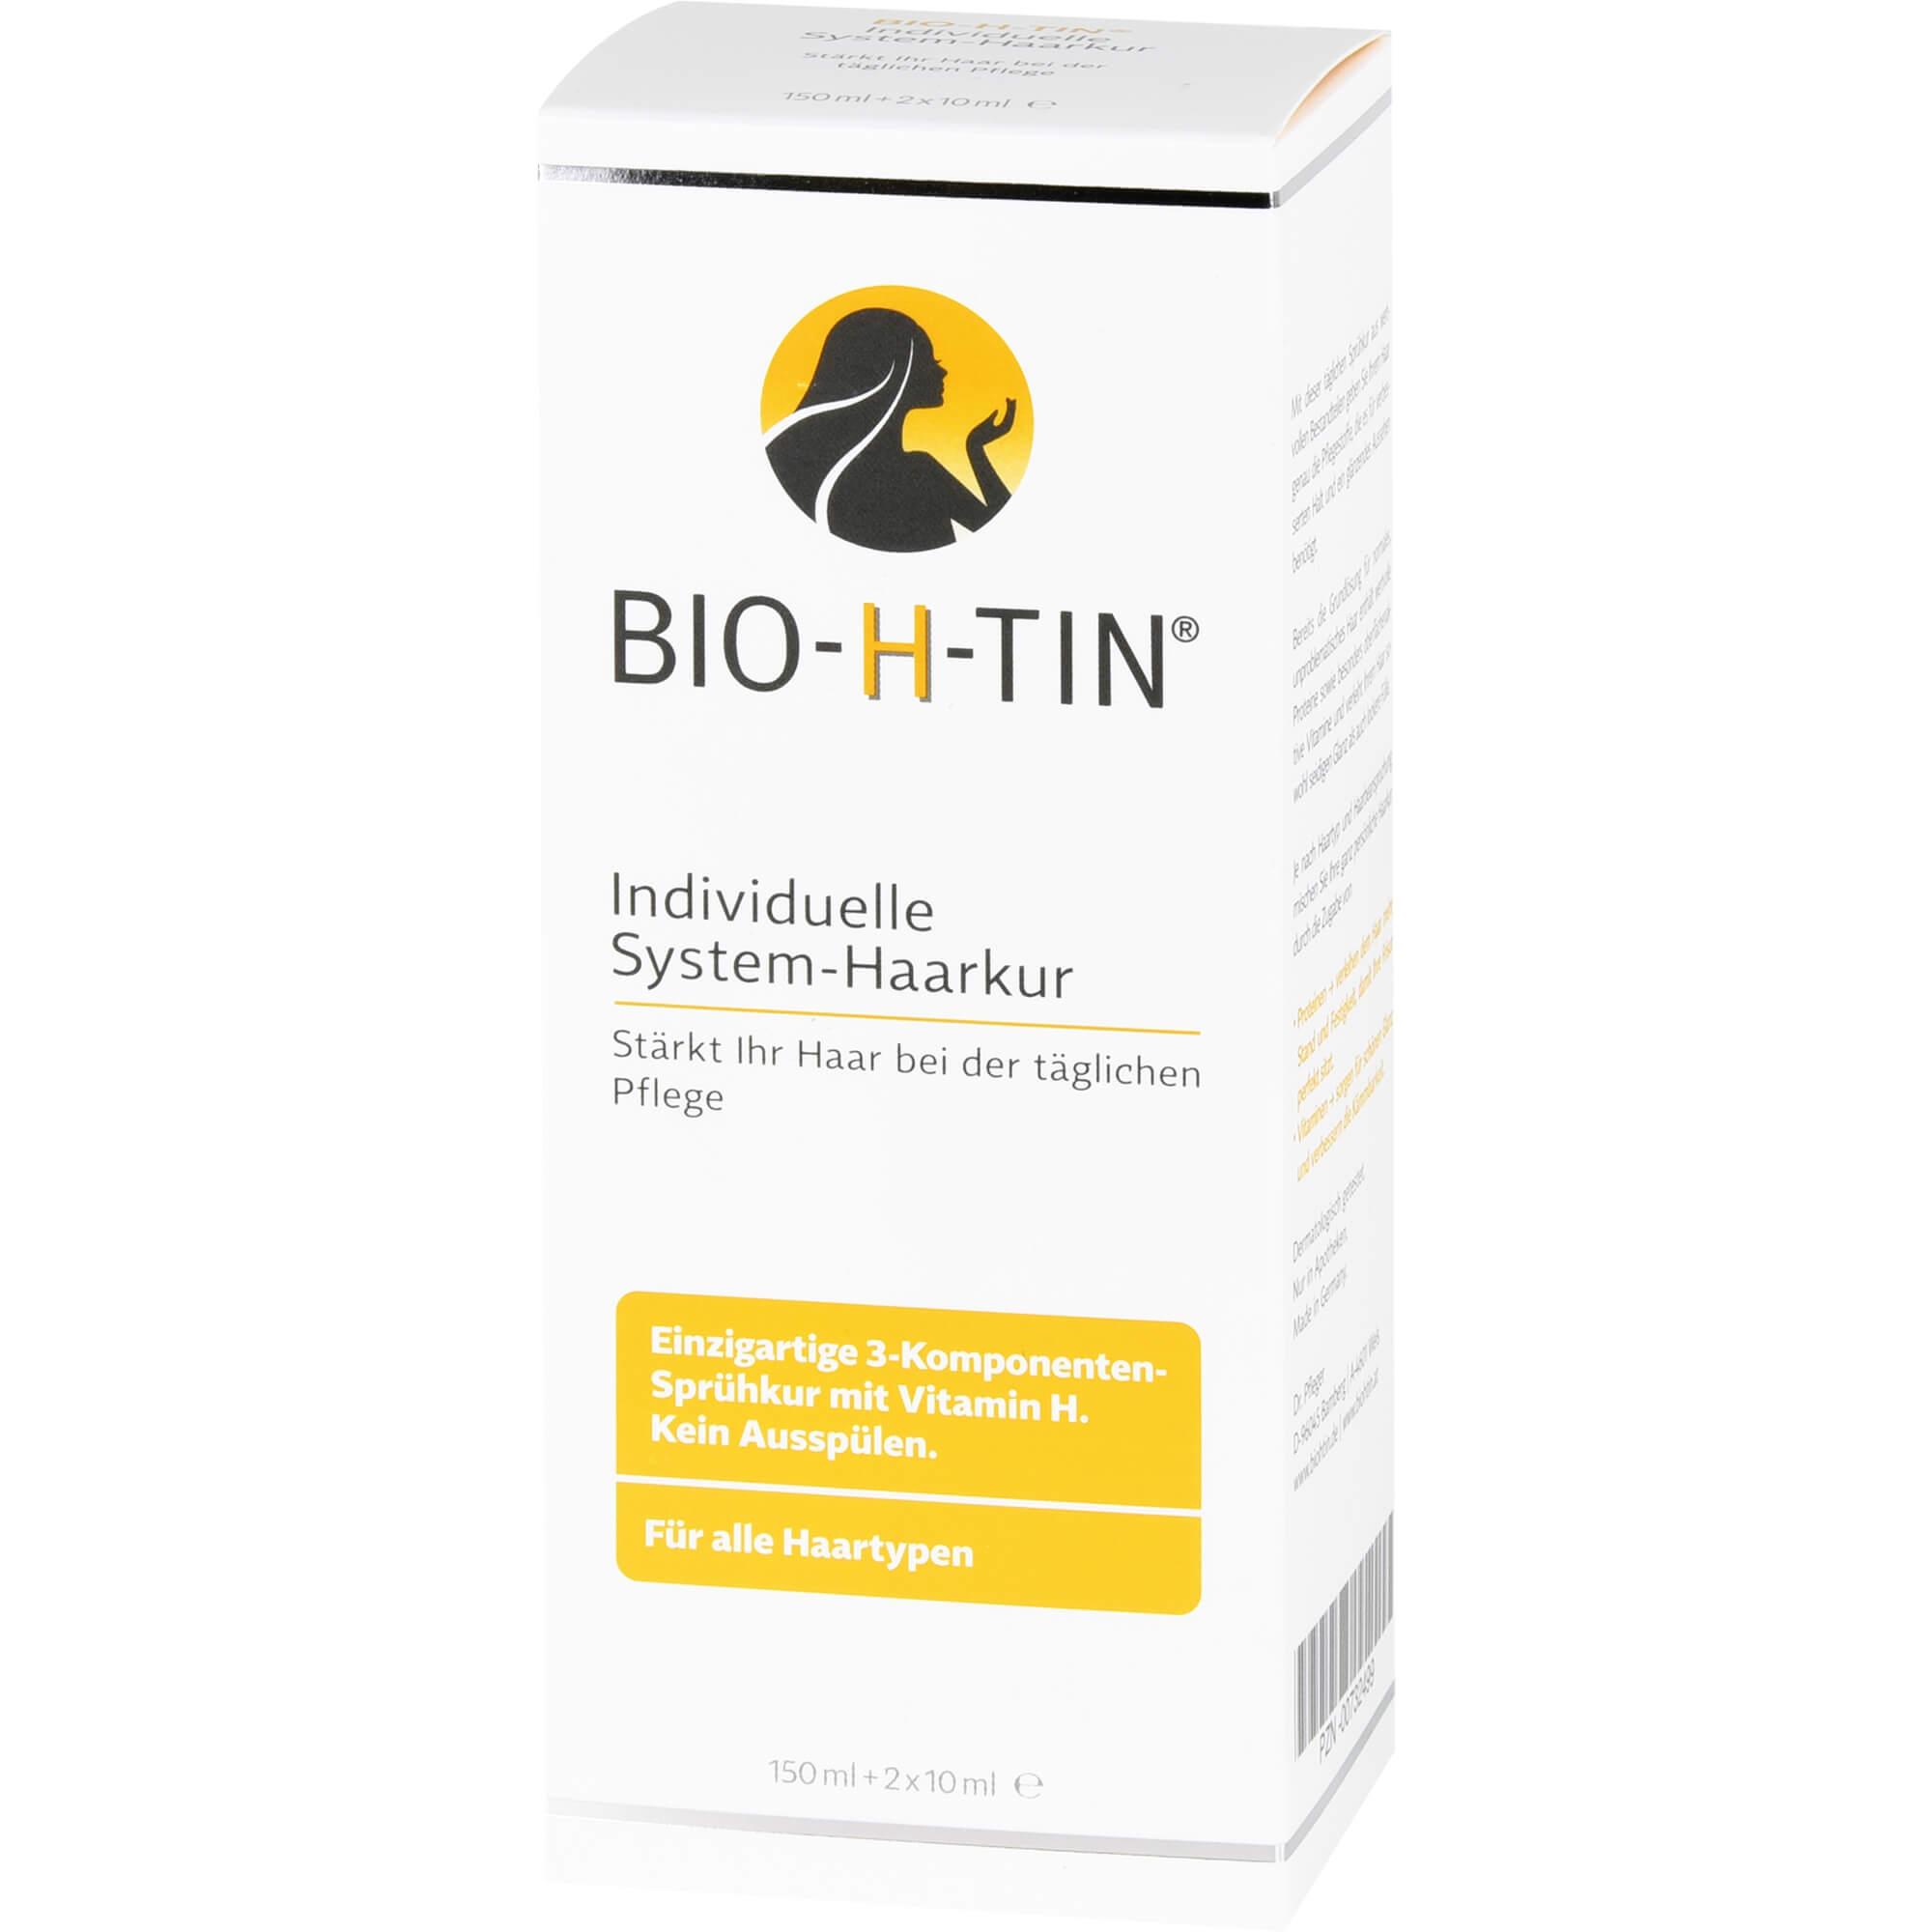 BIO-H-TIN System Haarkur